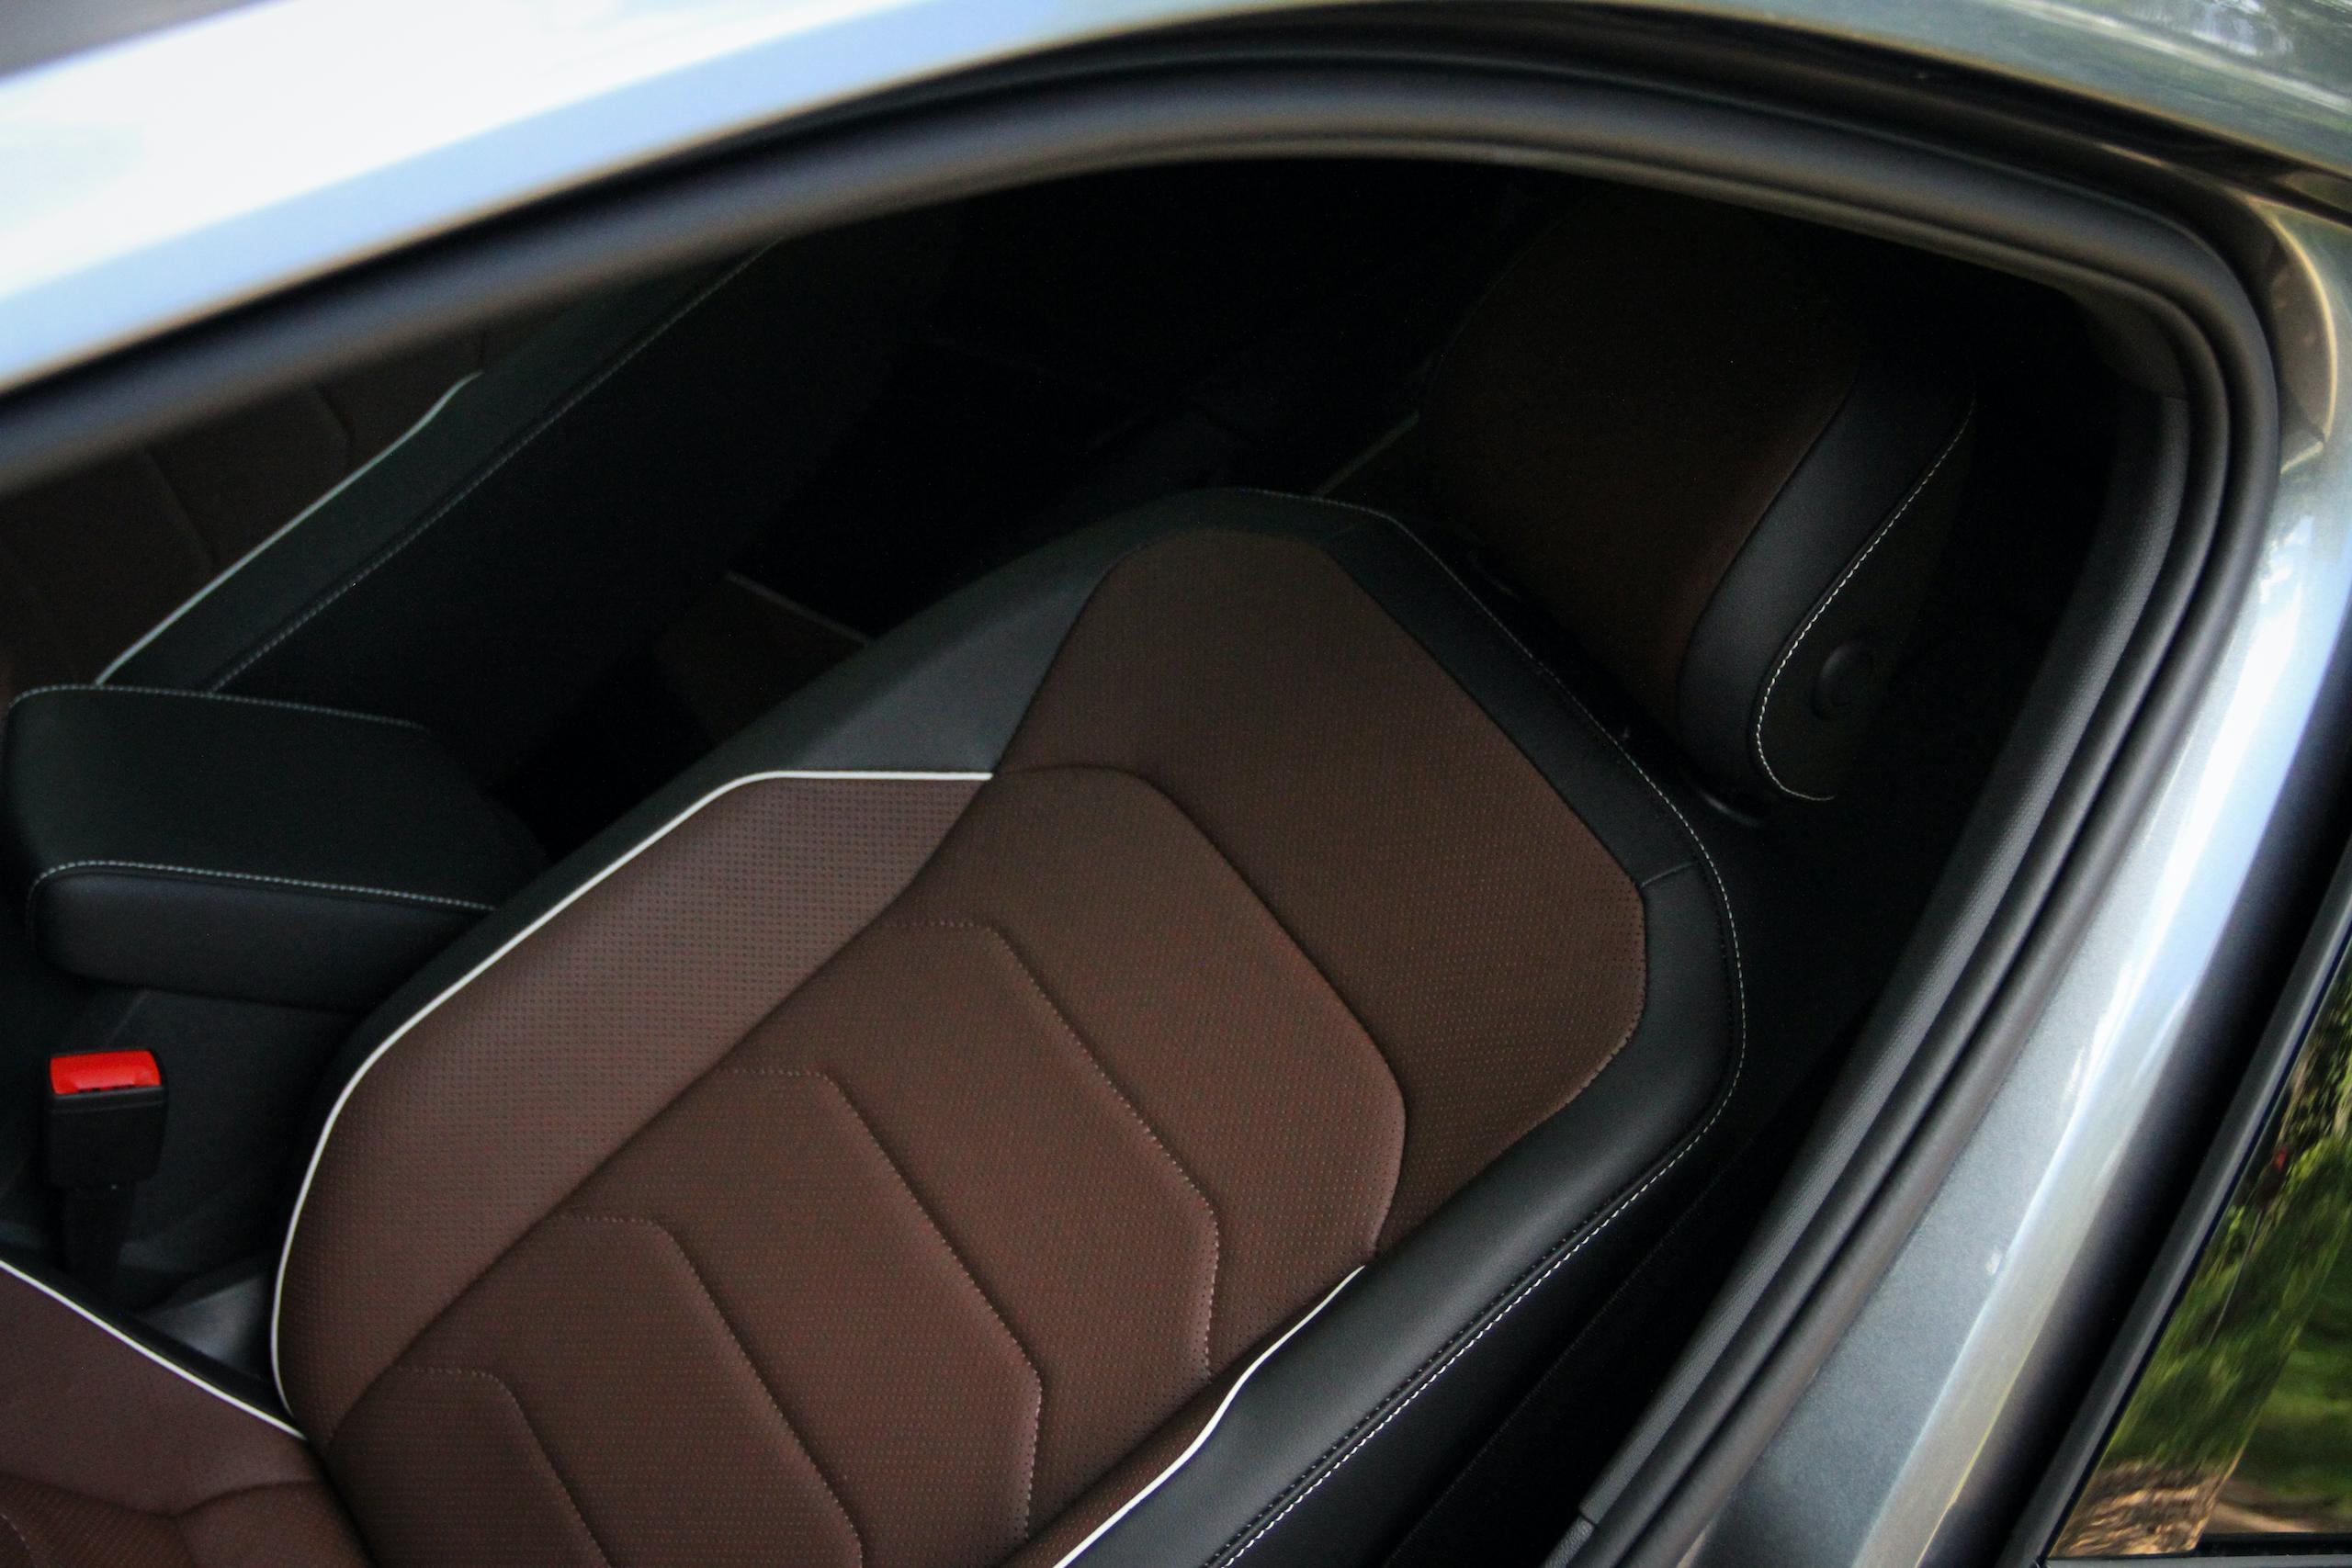 2022 VW Tiguan SEL R-Line leather seat